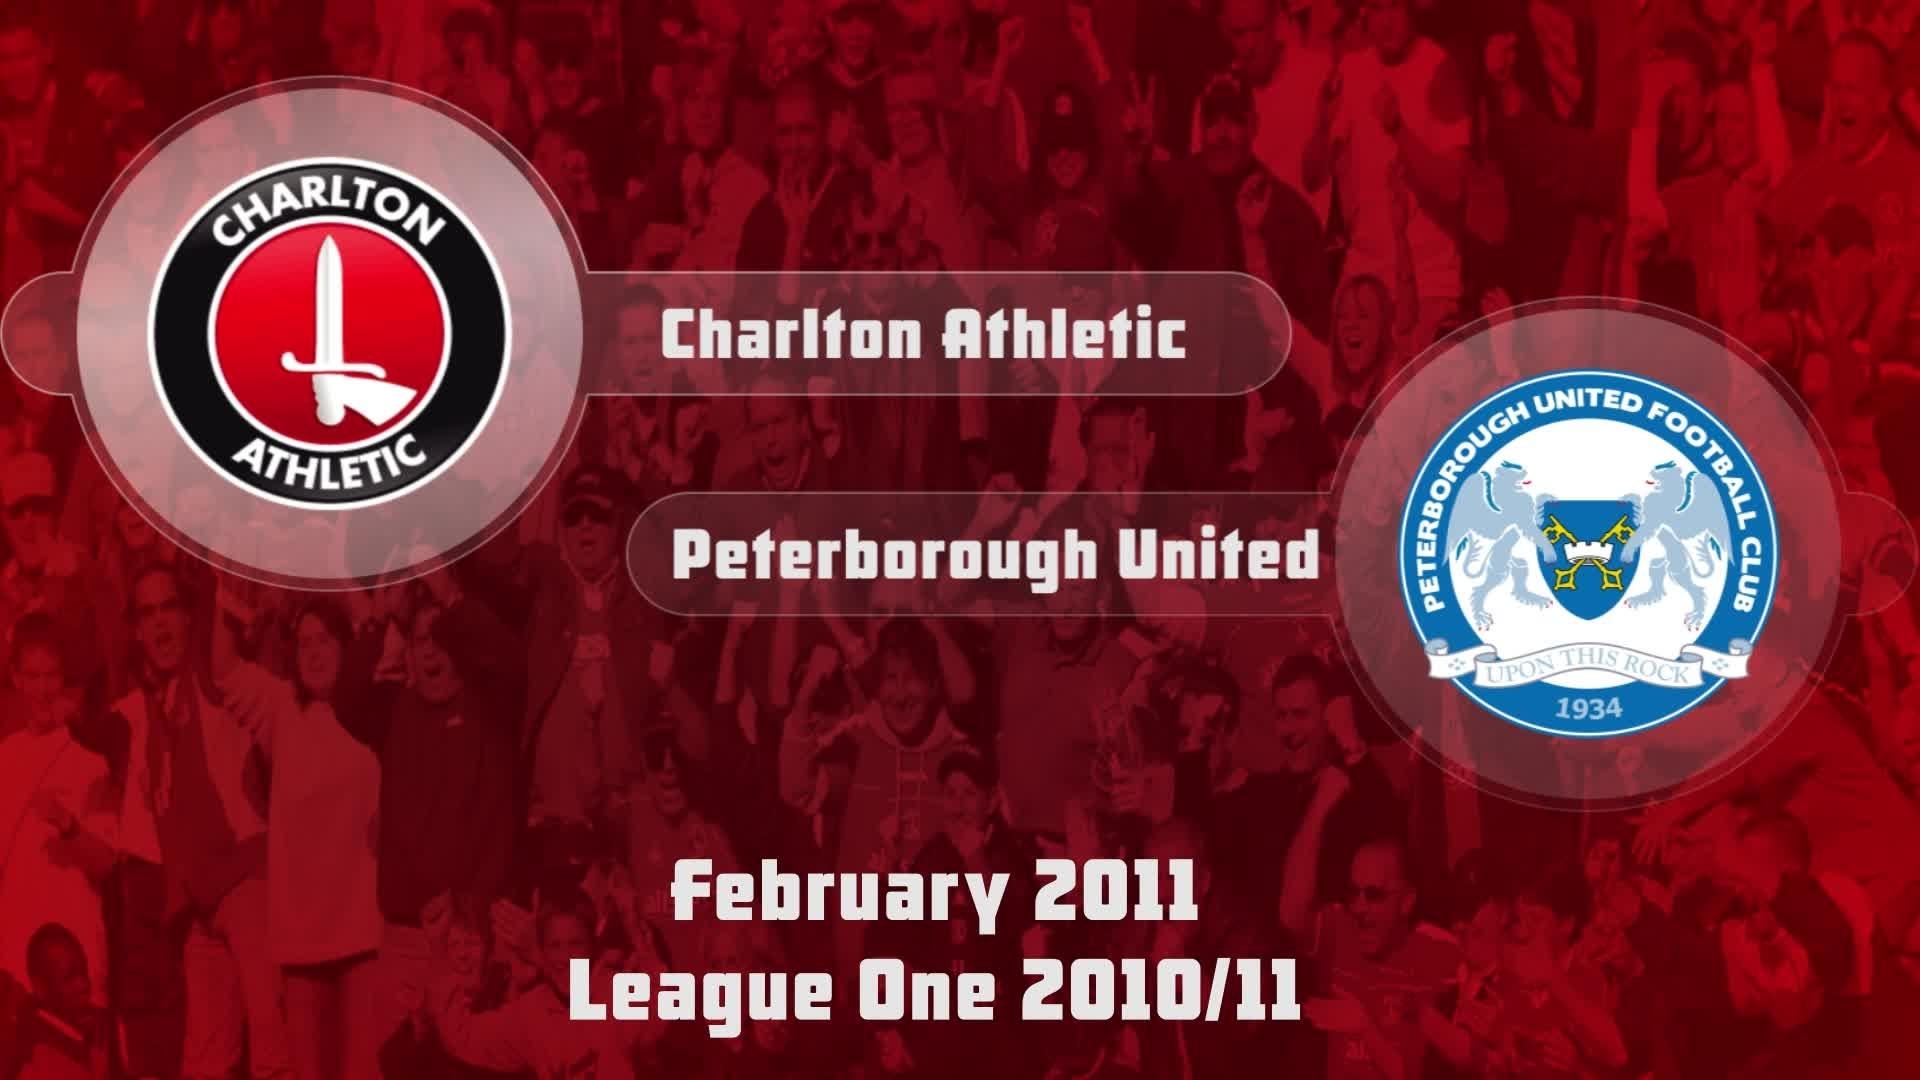 37 HIGHLIGHTS | Charlton 3 Peterborough 2 (Feb 2011)